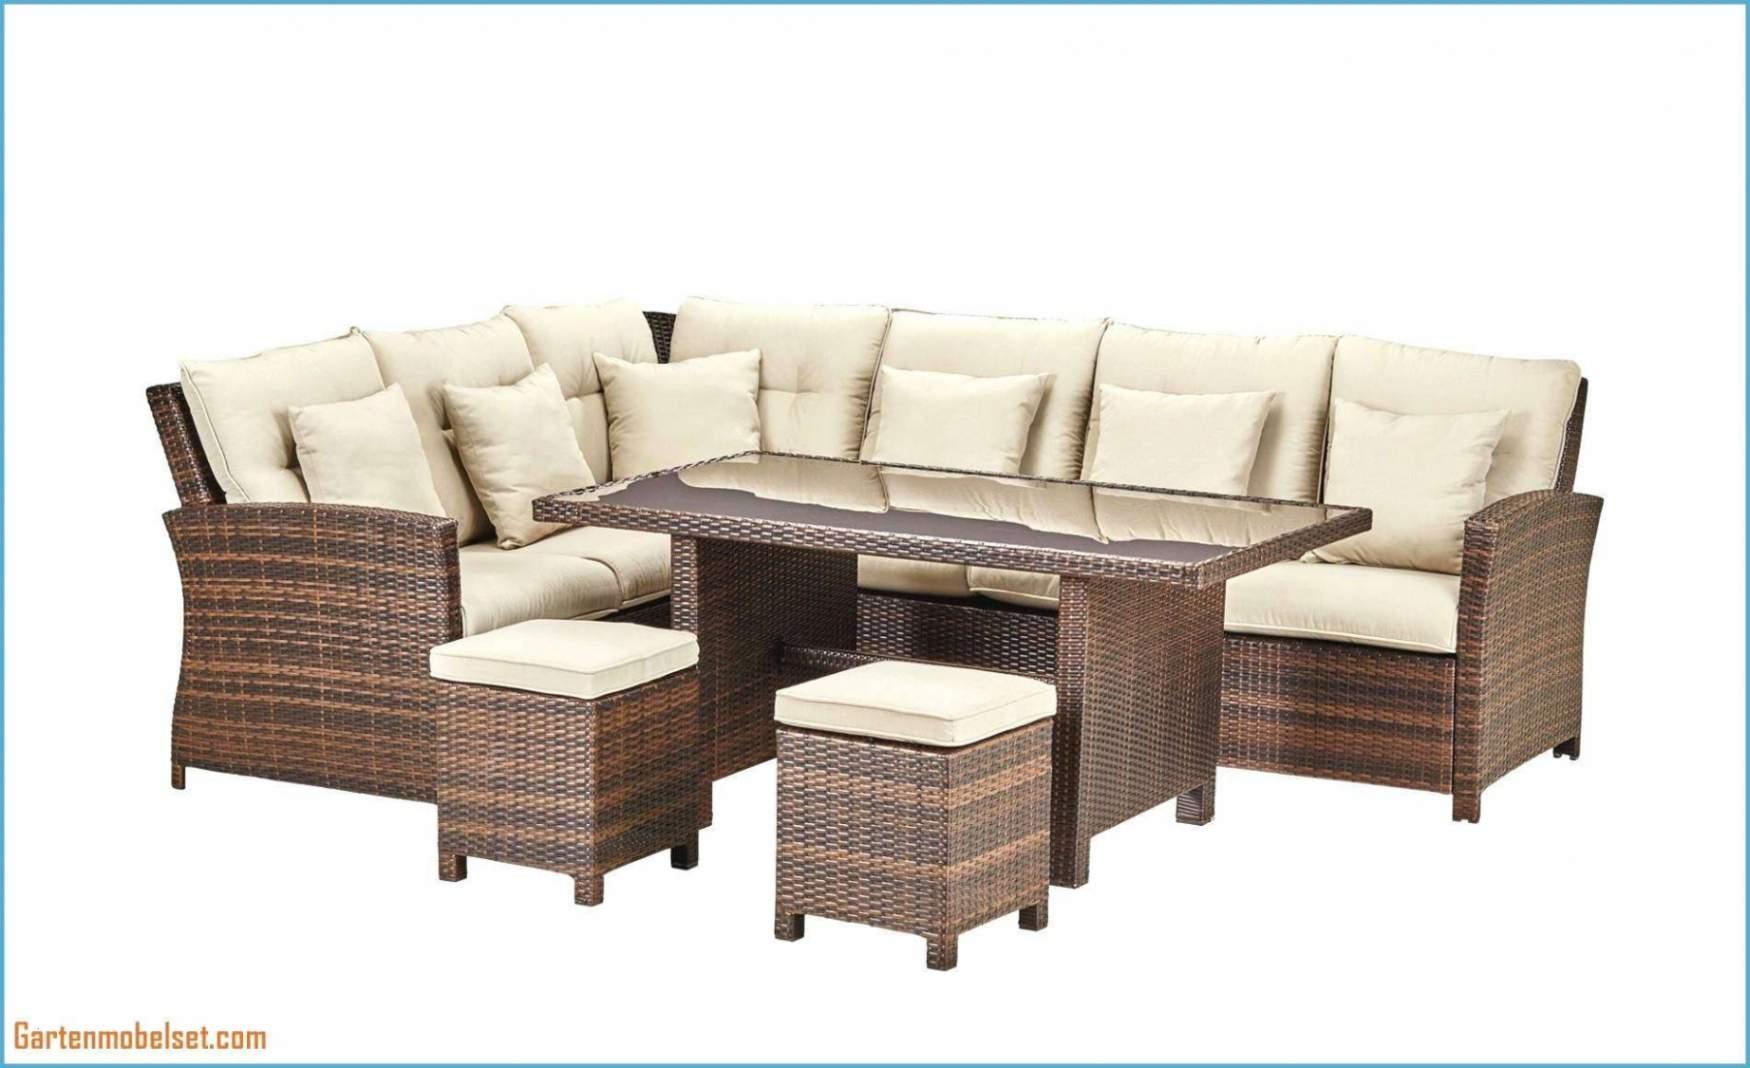 lounge mobel selber bauen yct projekte lounge mobel selber bauen lounge mobel selber bauen 4